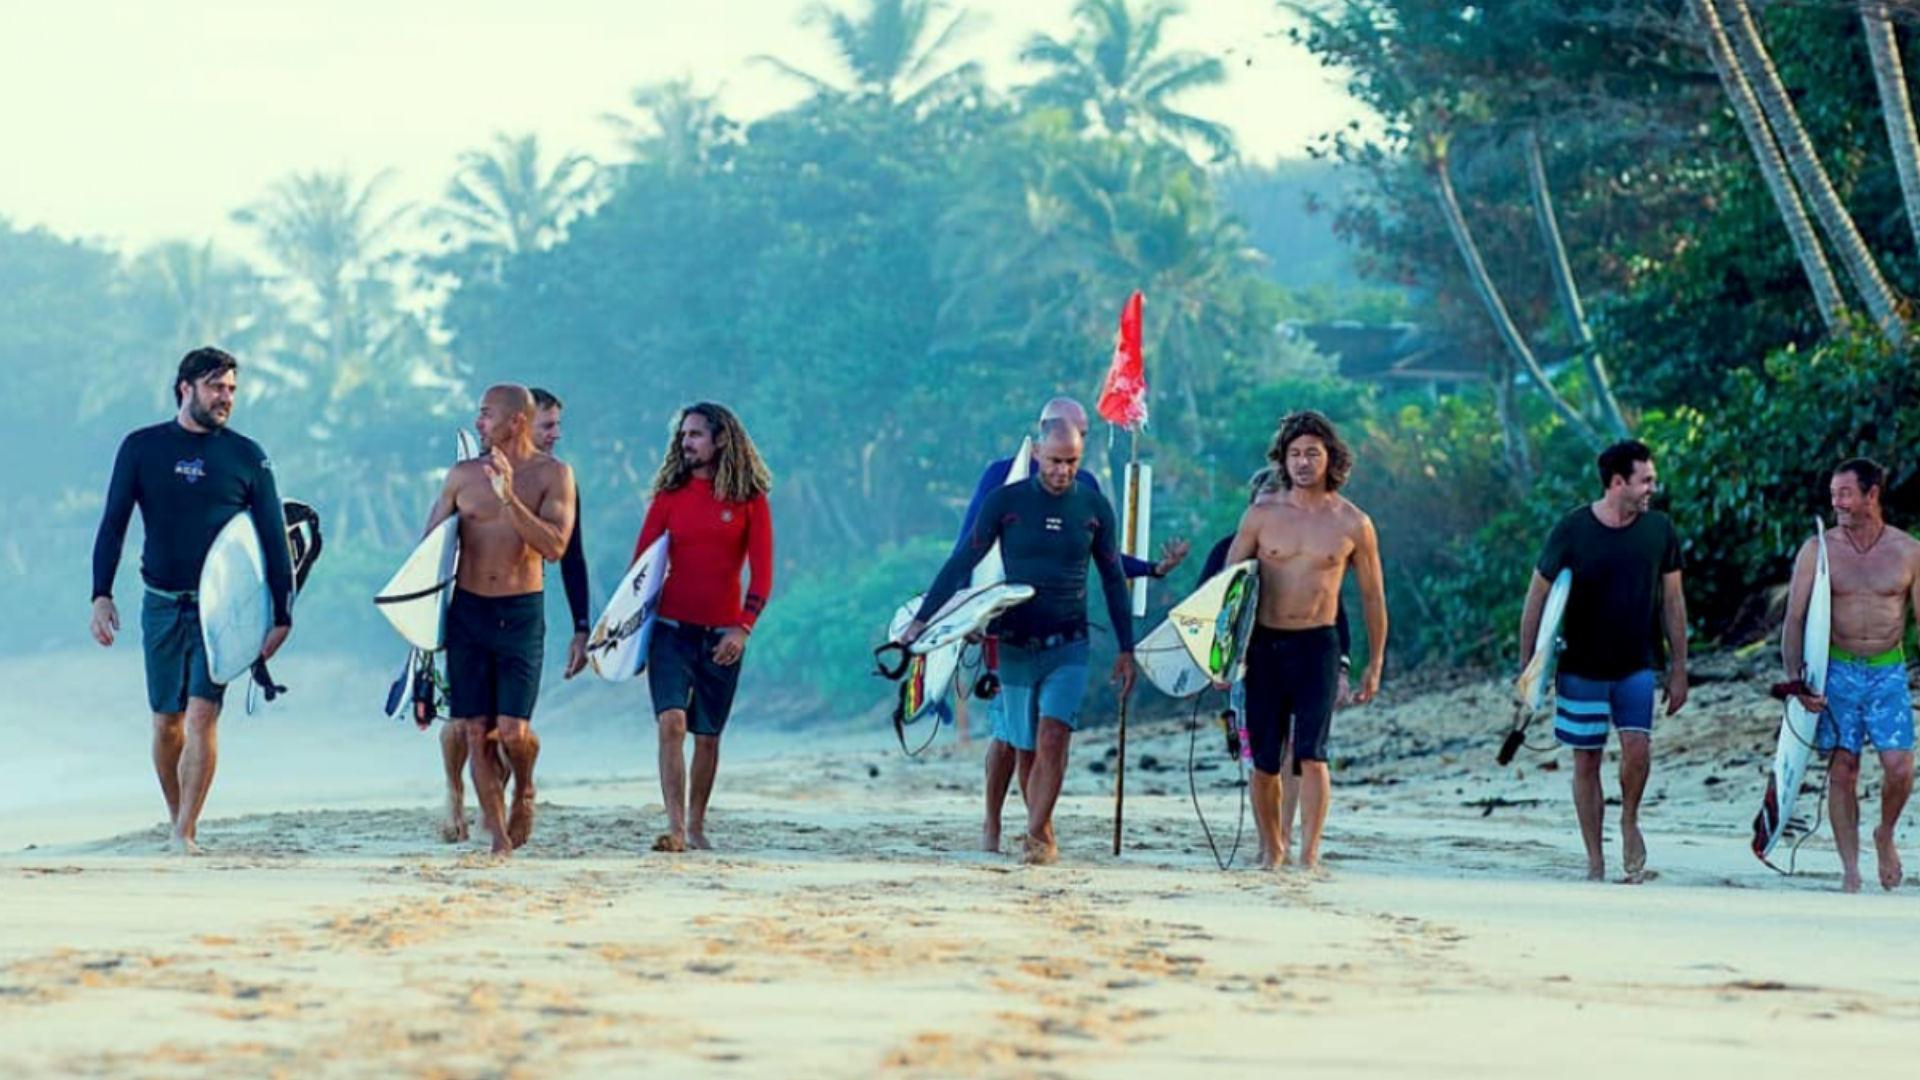 Momentum Generation Surf Movie